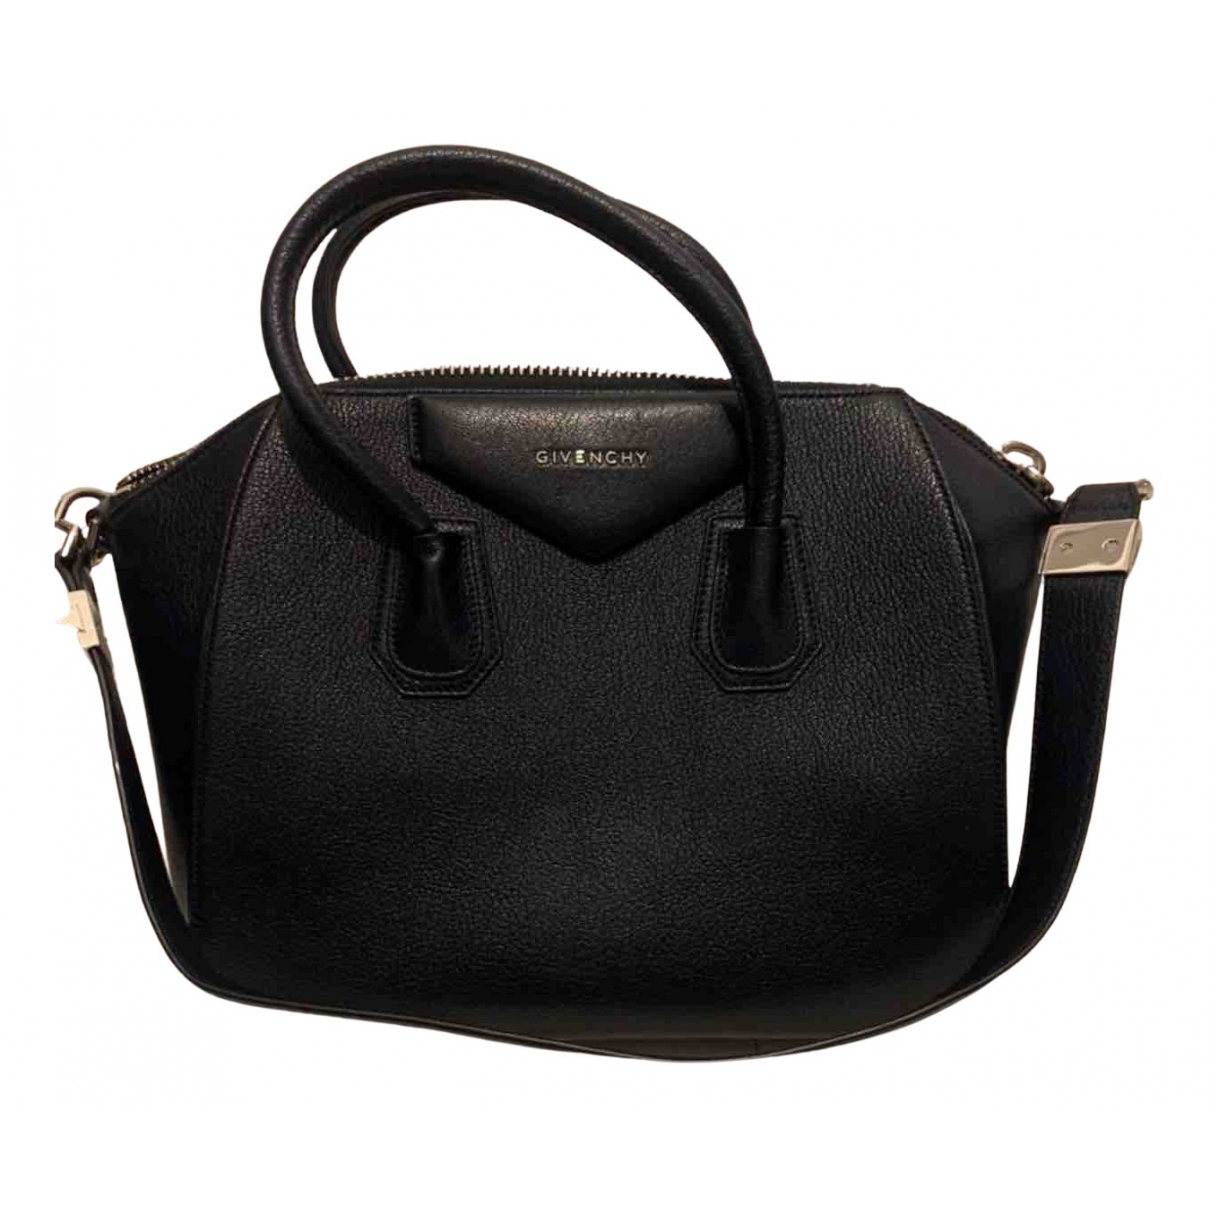 Givenchy - Sac a main Antigona pour femme en cuir - marine